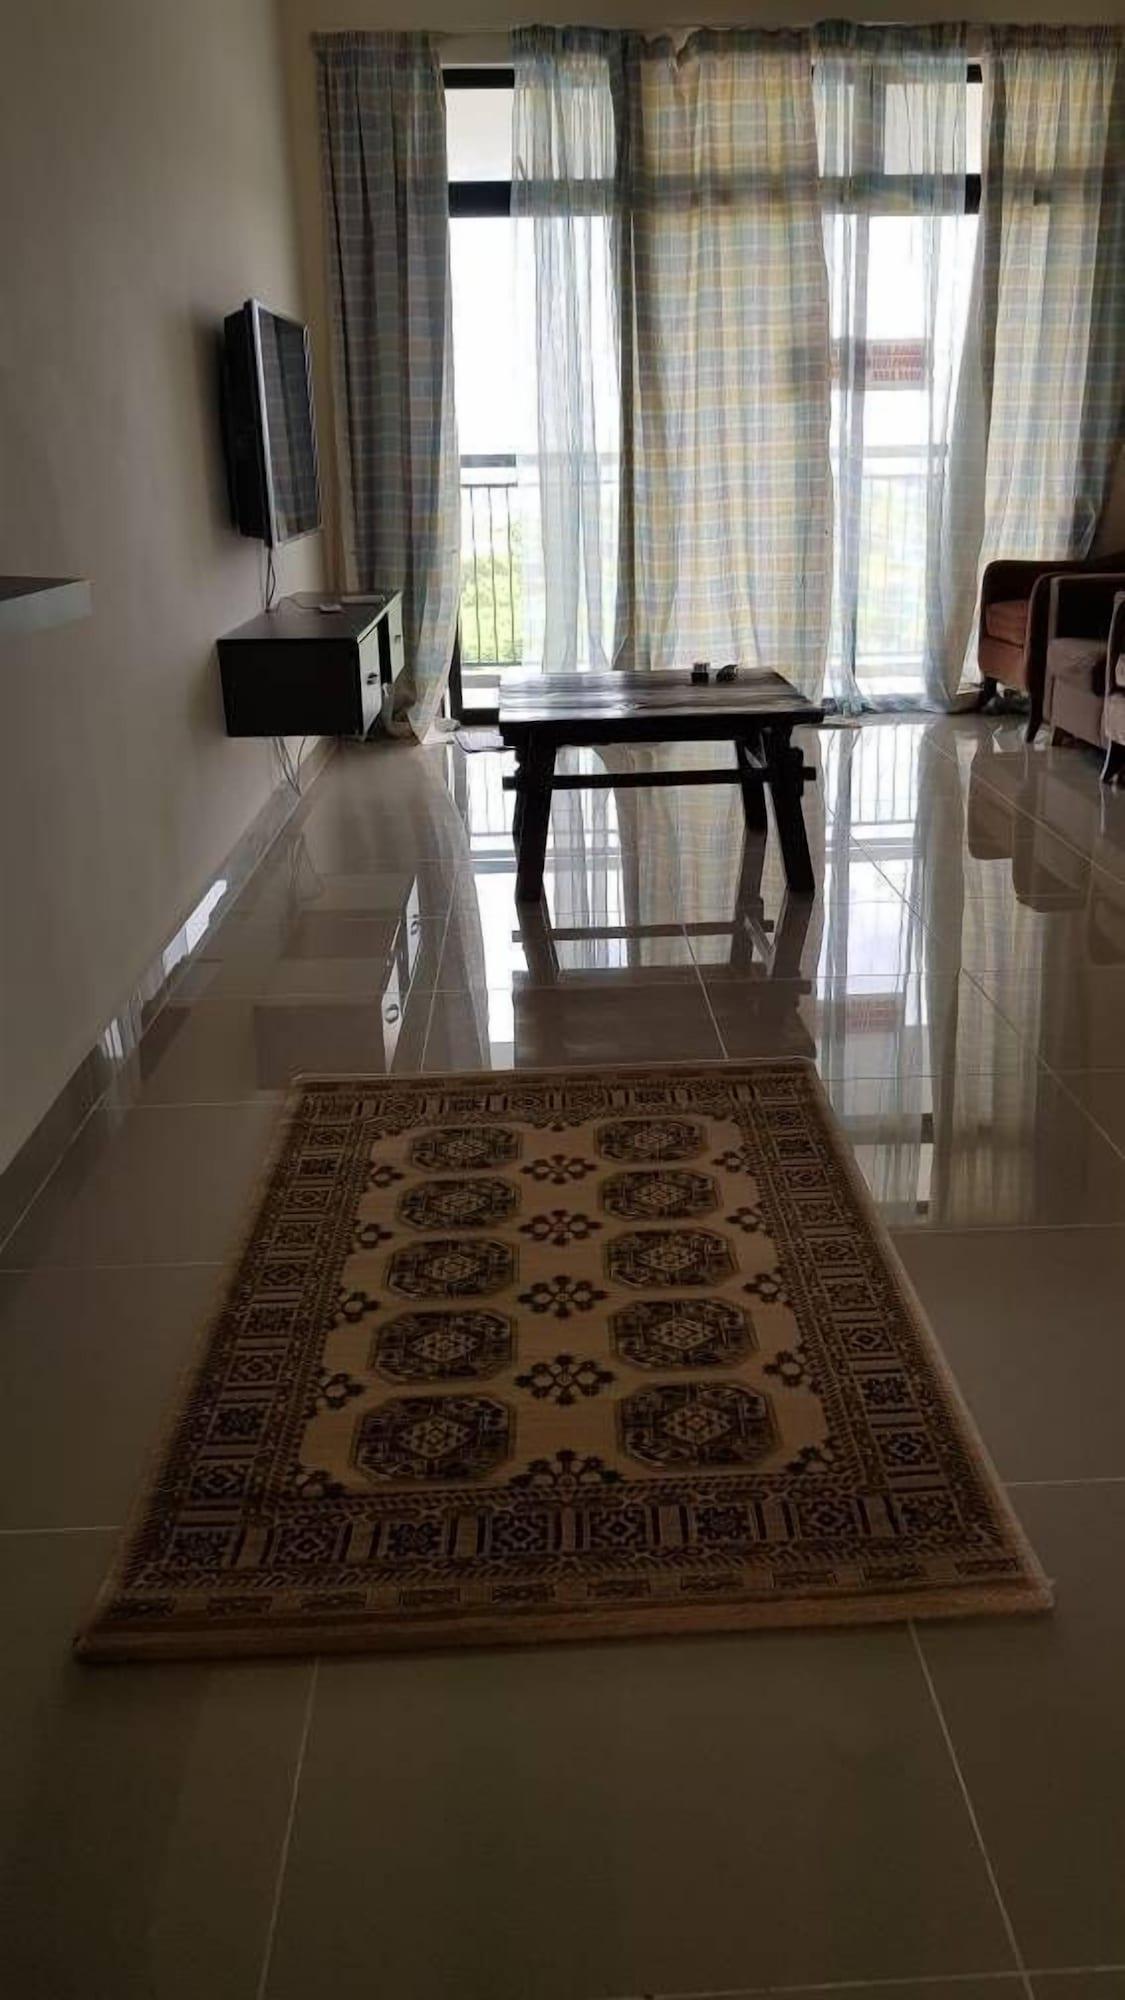 Ayer at 8 Putrajaya Guesthouse, Kuala Lumpur